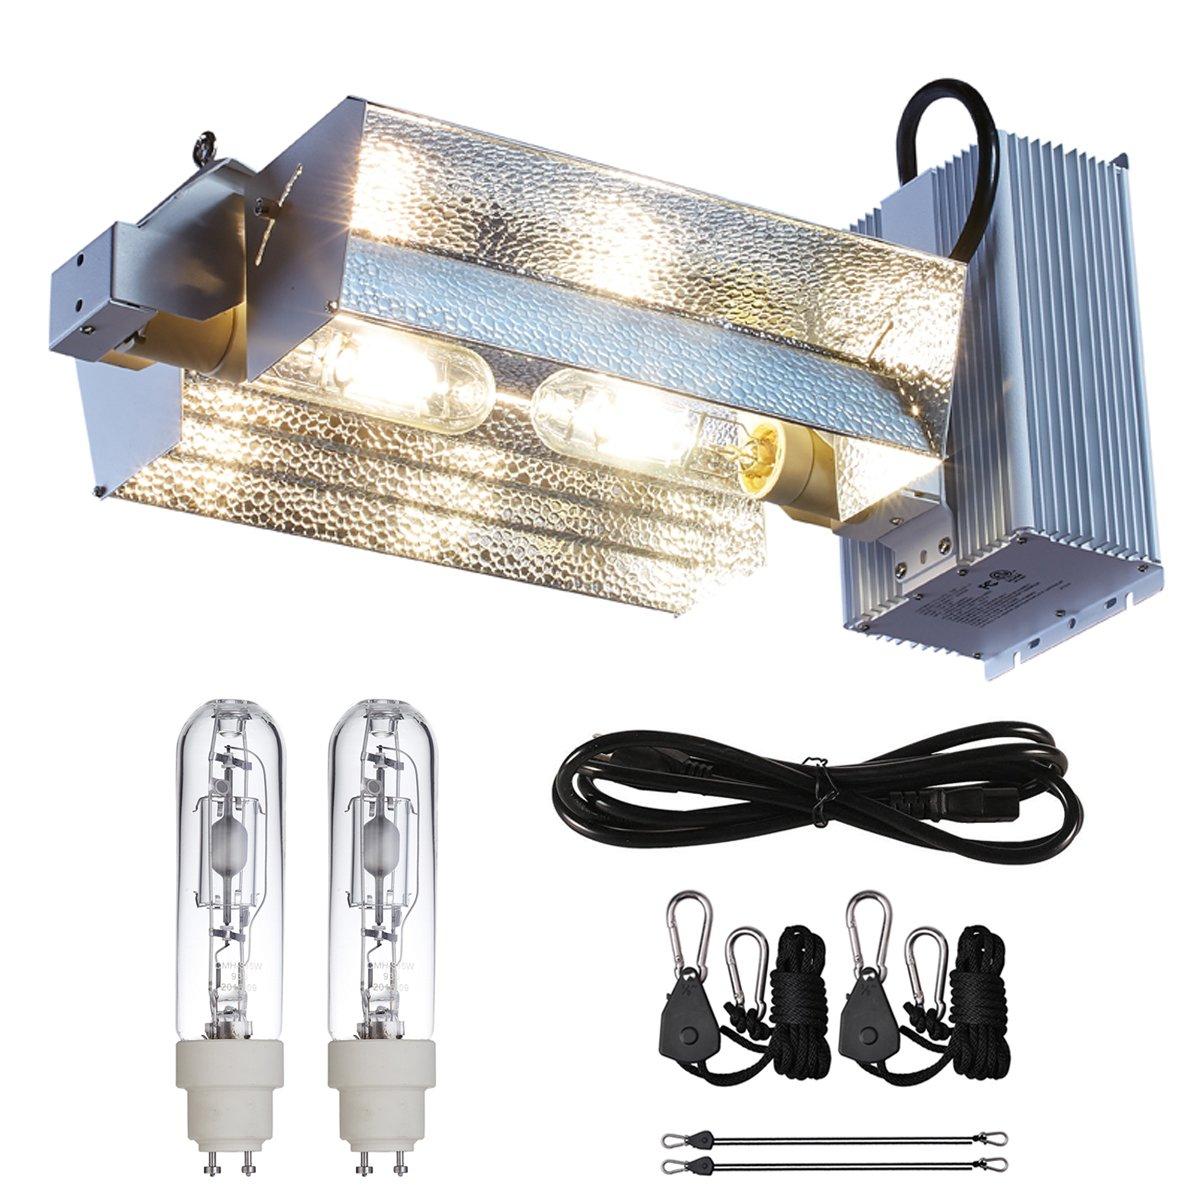 Hongruilite 630W 120V~240V Ceramic Metal Halide CMH CDM Grow Light Fixture Kit w/3100K Bulb 120V Power Cord Replace LED Full Spectrum Grow Light (CMH 630W (Wide ))